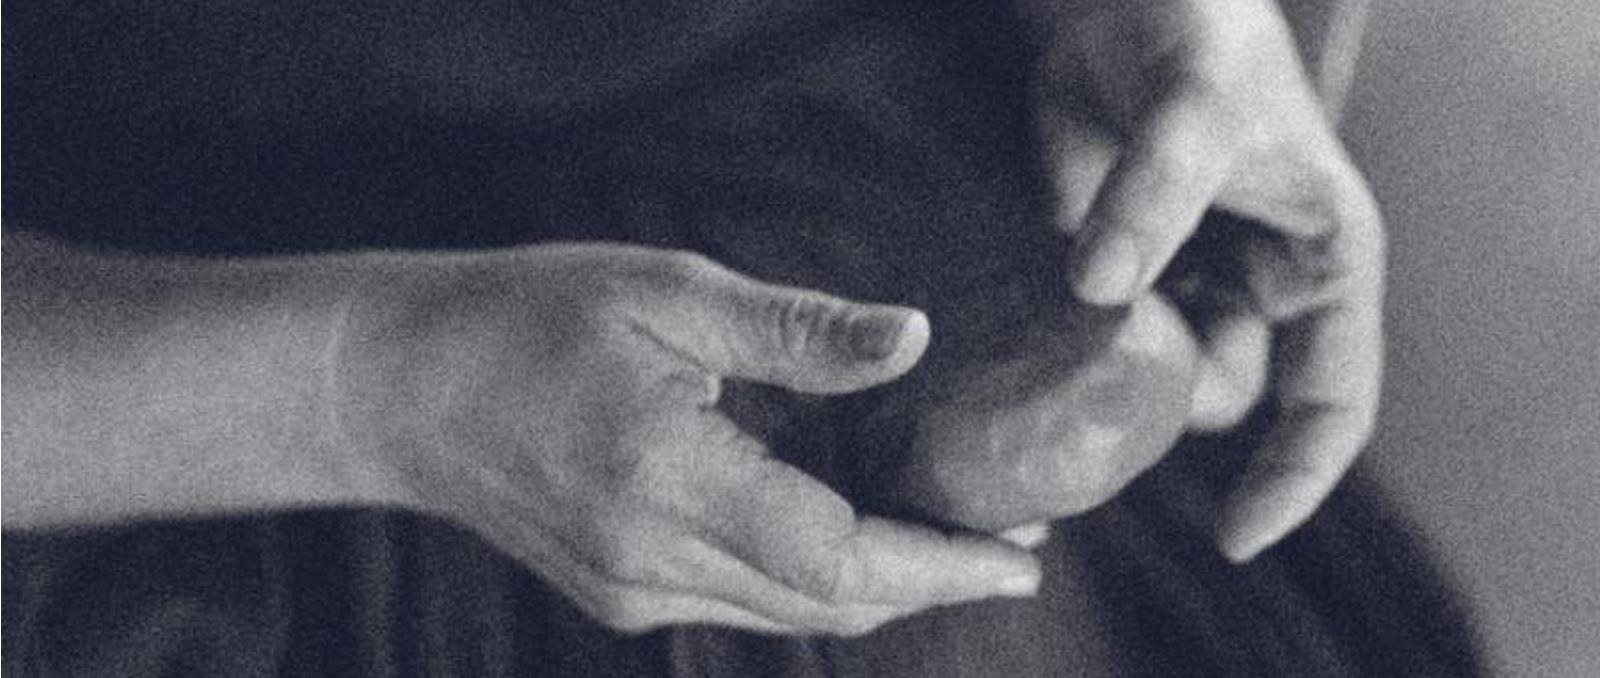 RIIJA-hands